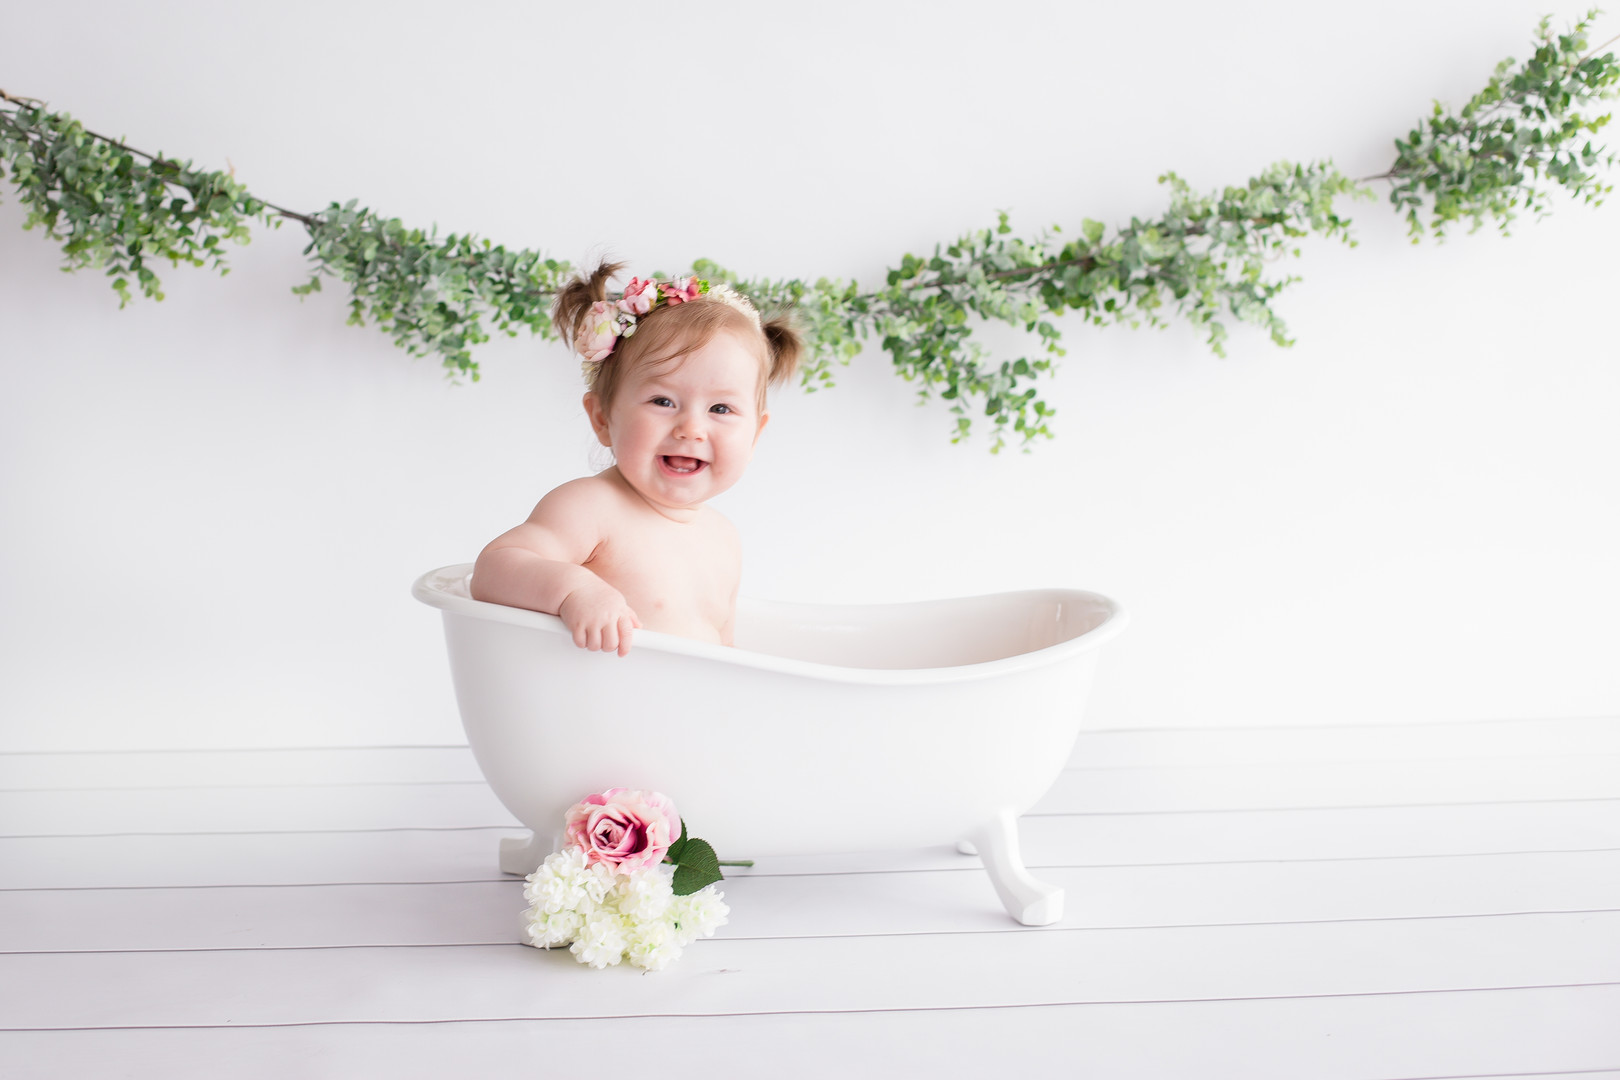 Photographe bébé, Beaune Bourgogne